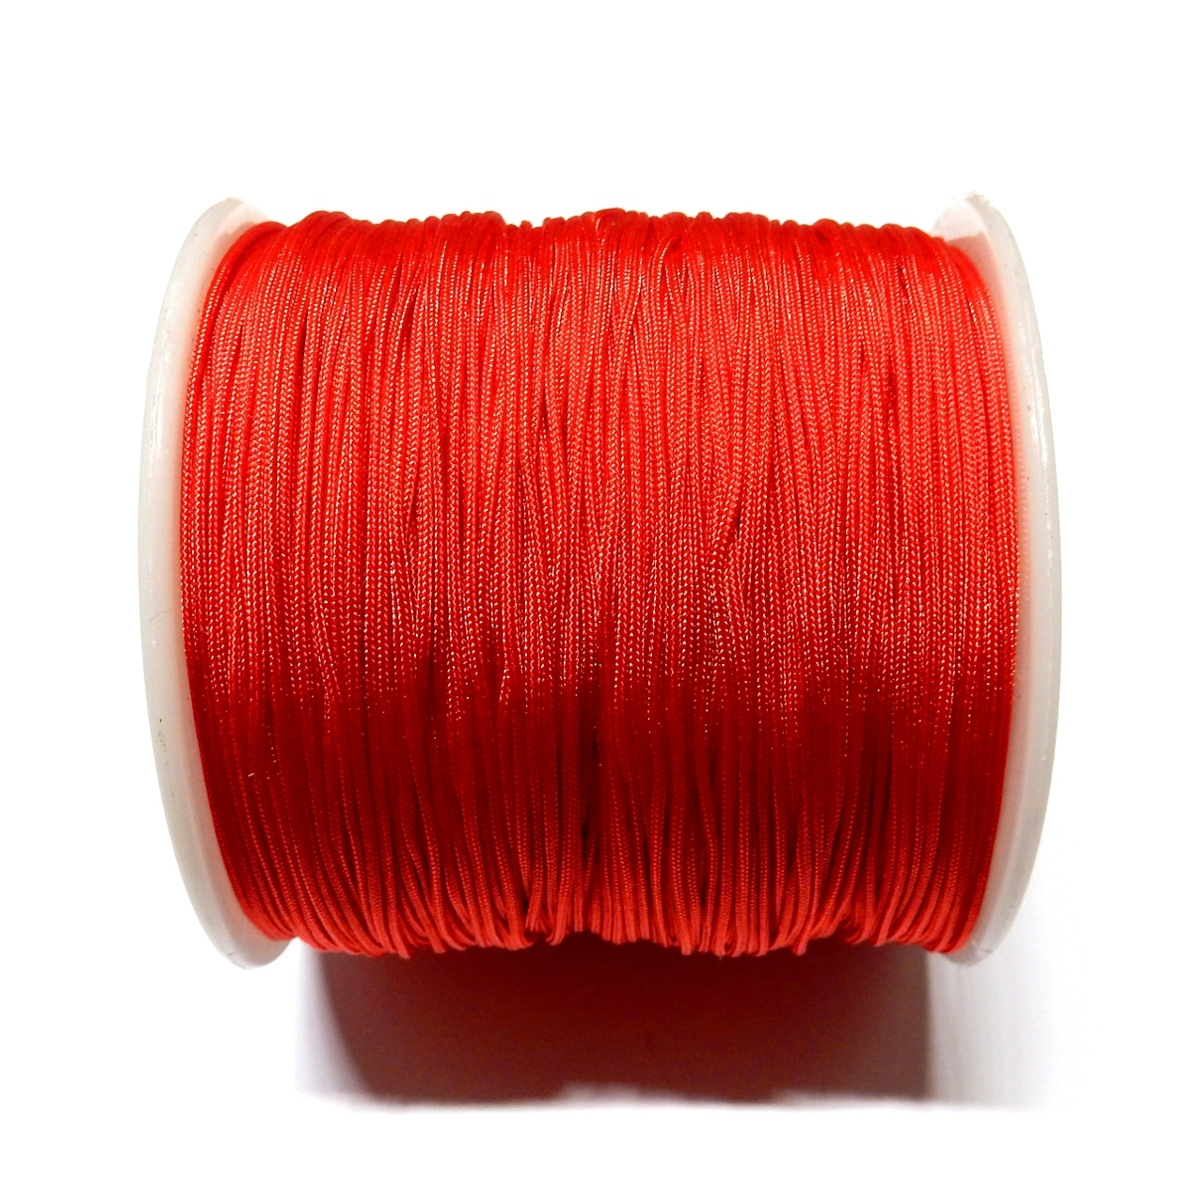 Nylon Cord 0.7mm - Red 700